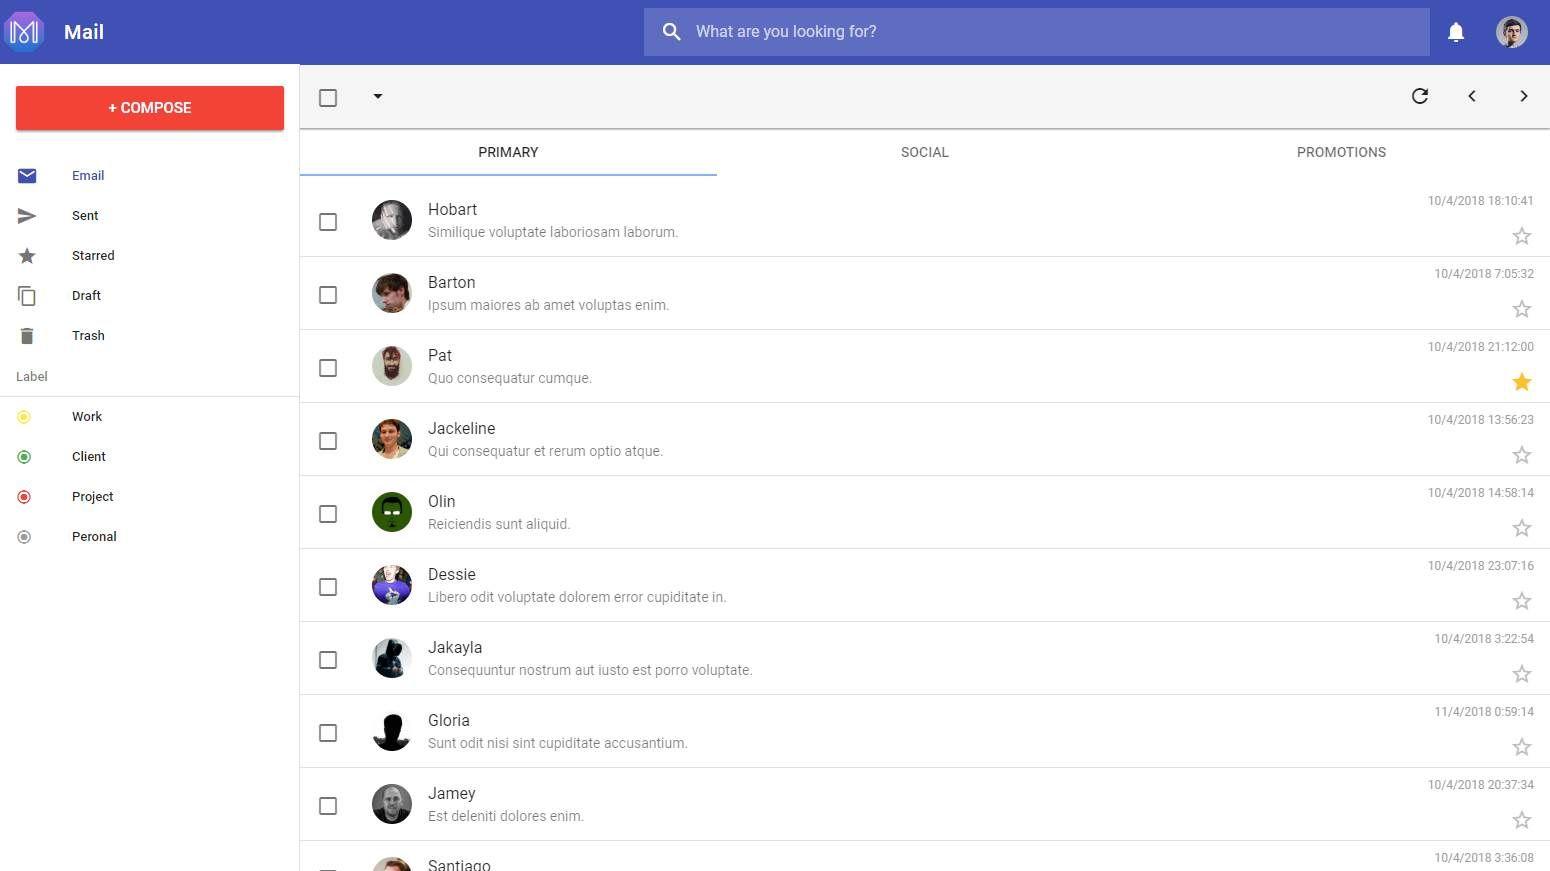 Vue Material Admin: A vue material design template